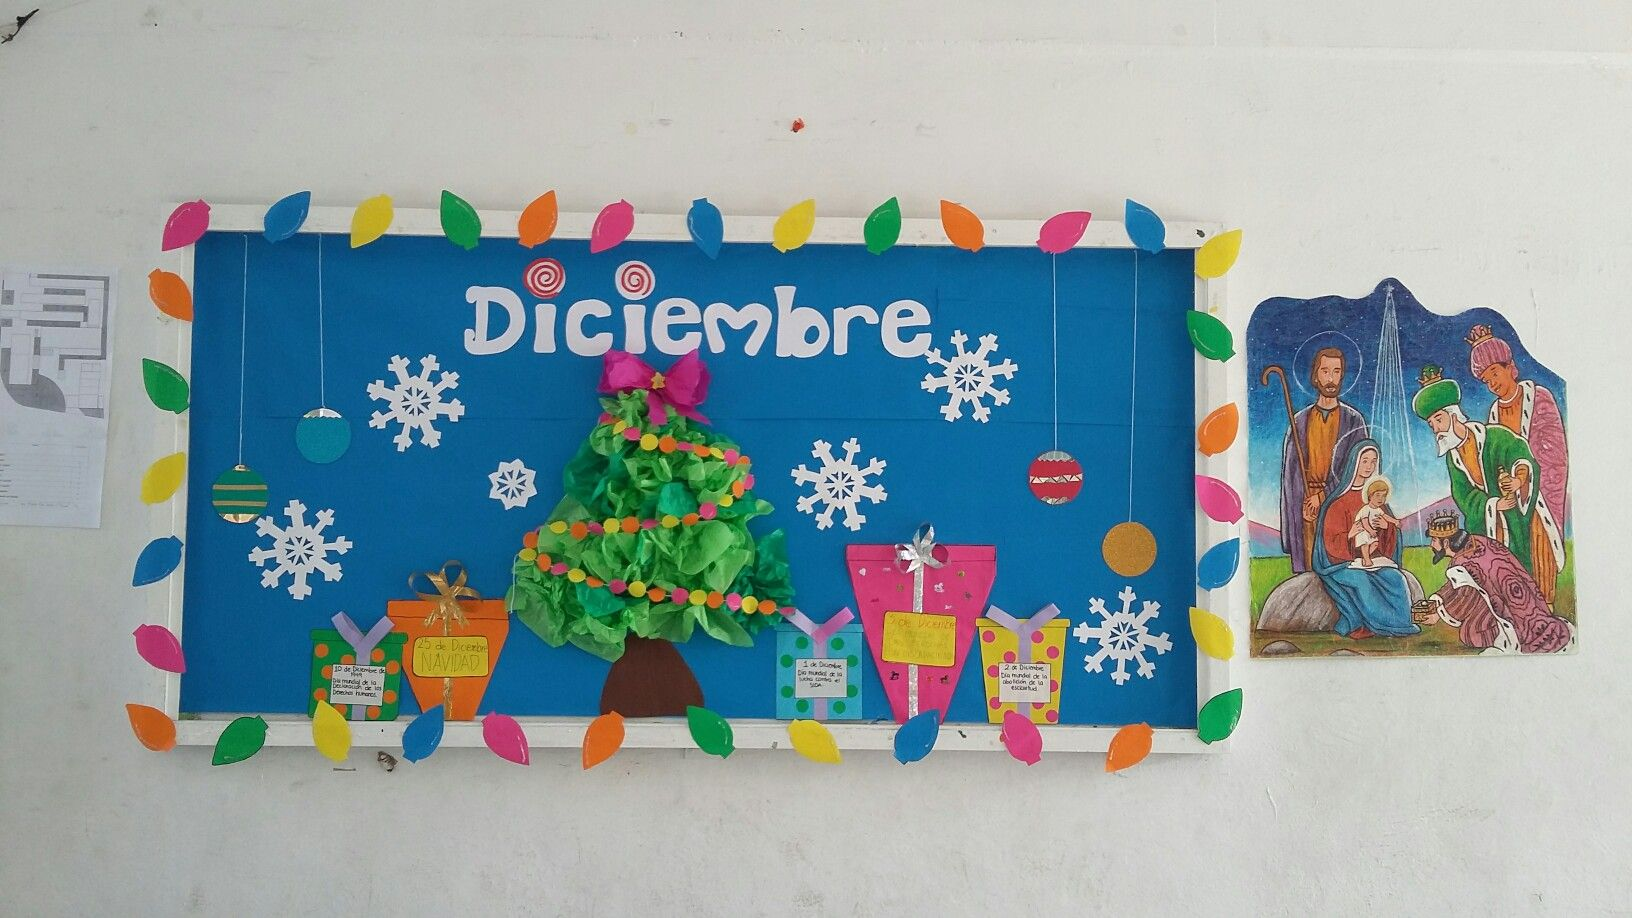 Diciembre periodico mural preescolar pinterest - Murales decorativos de navidad ...